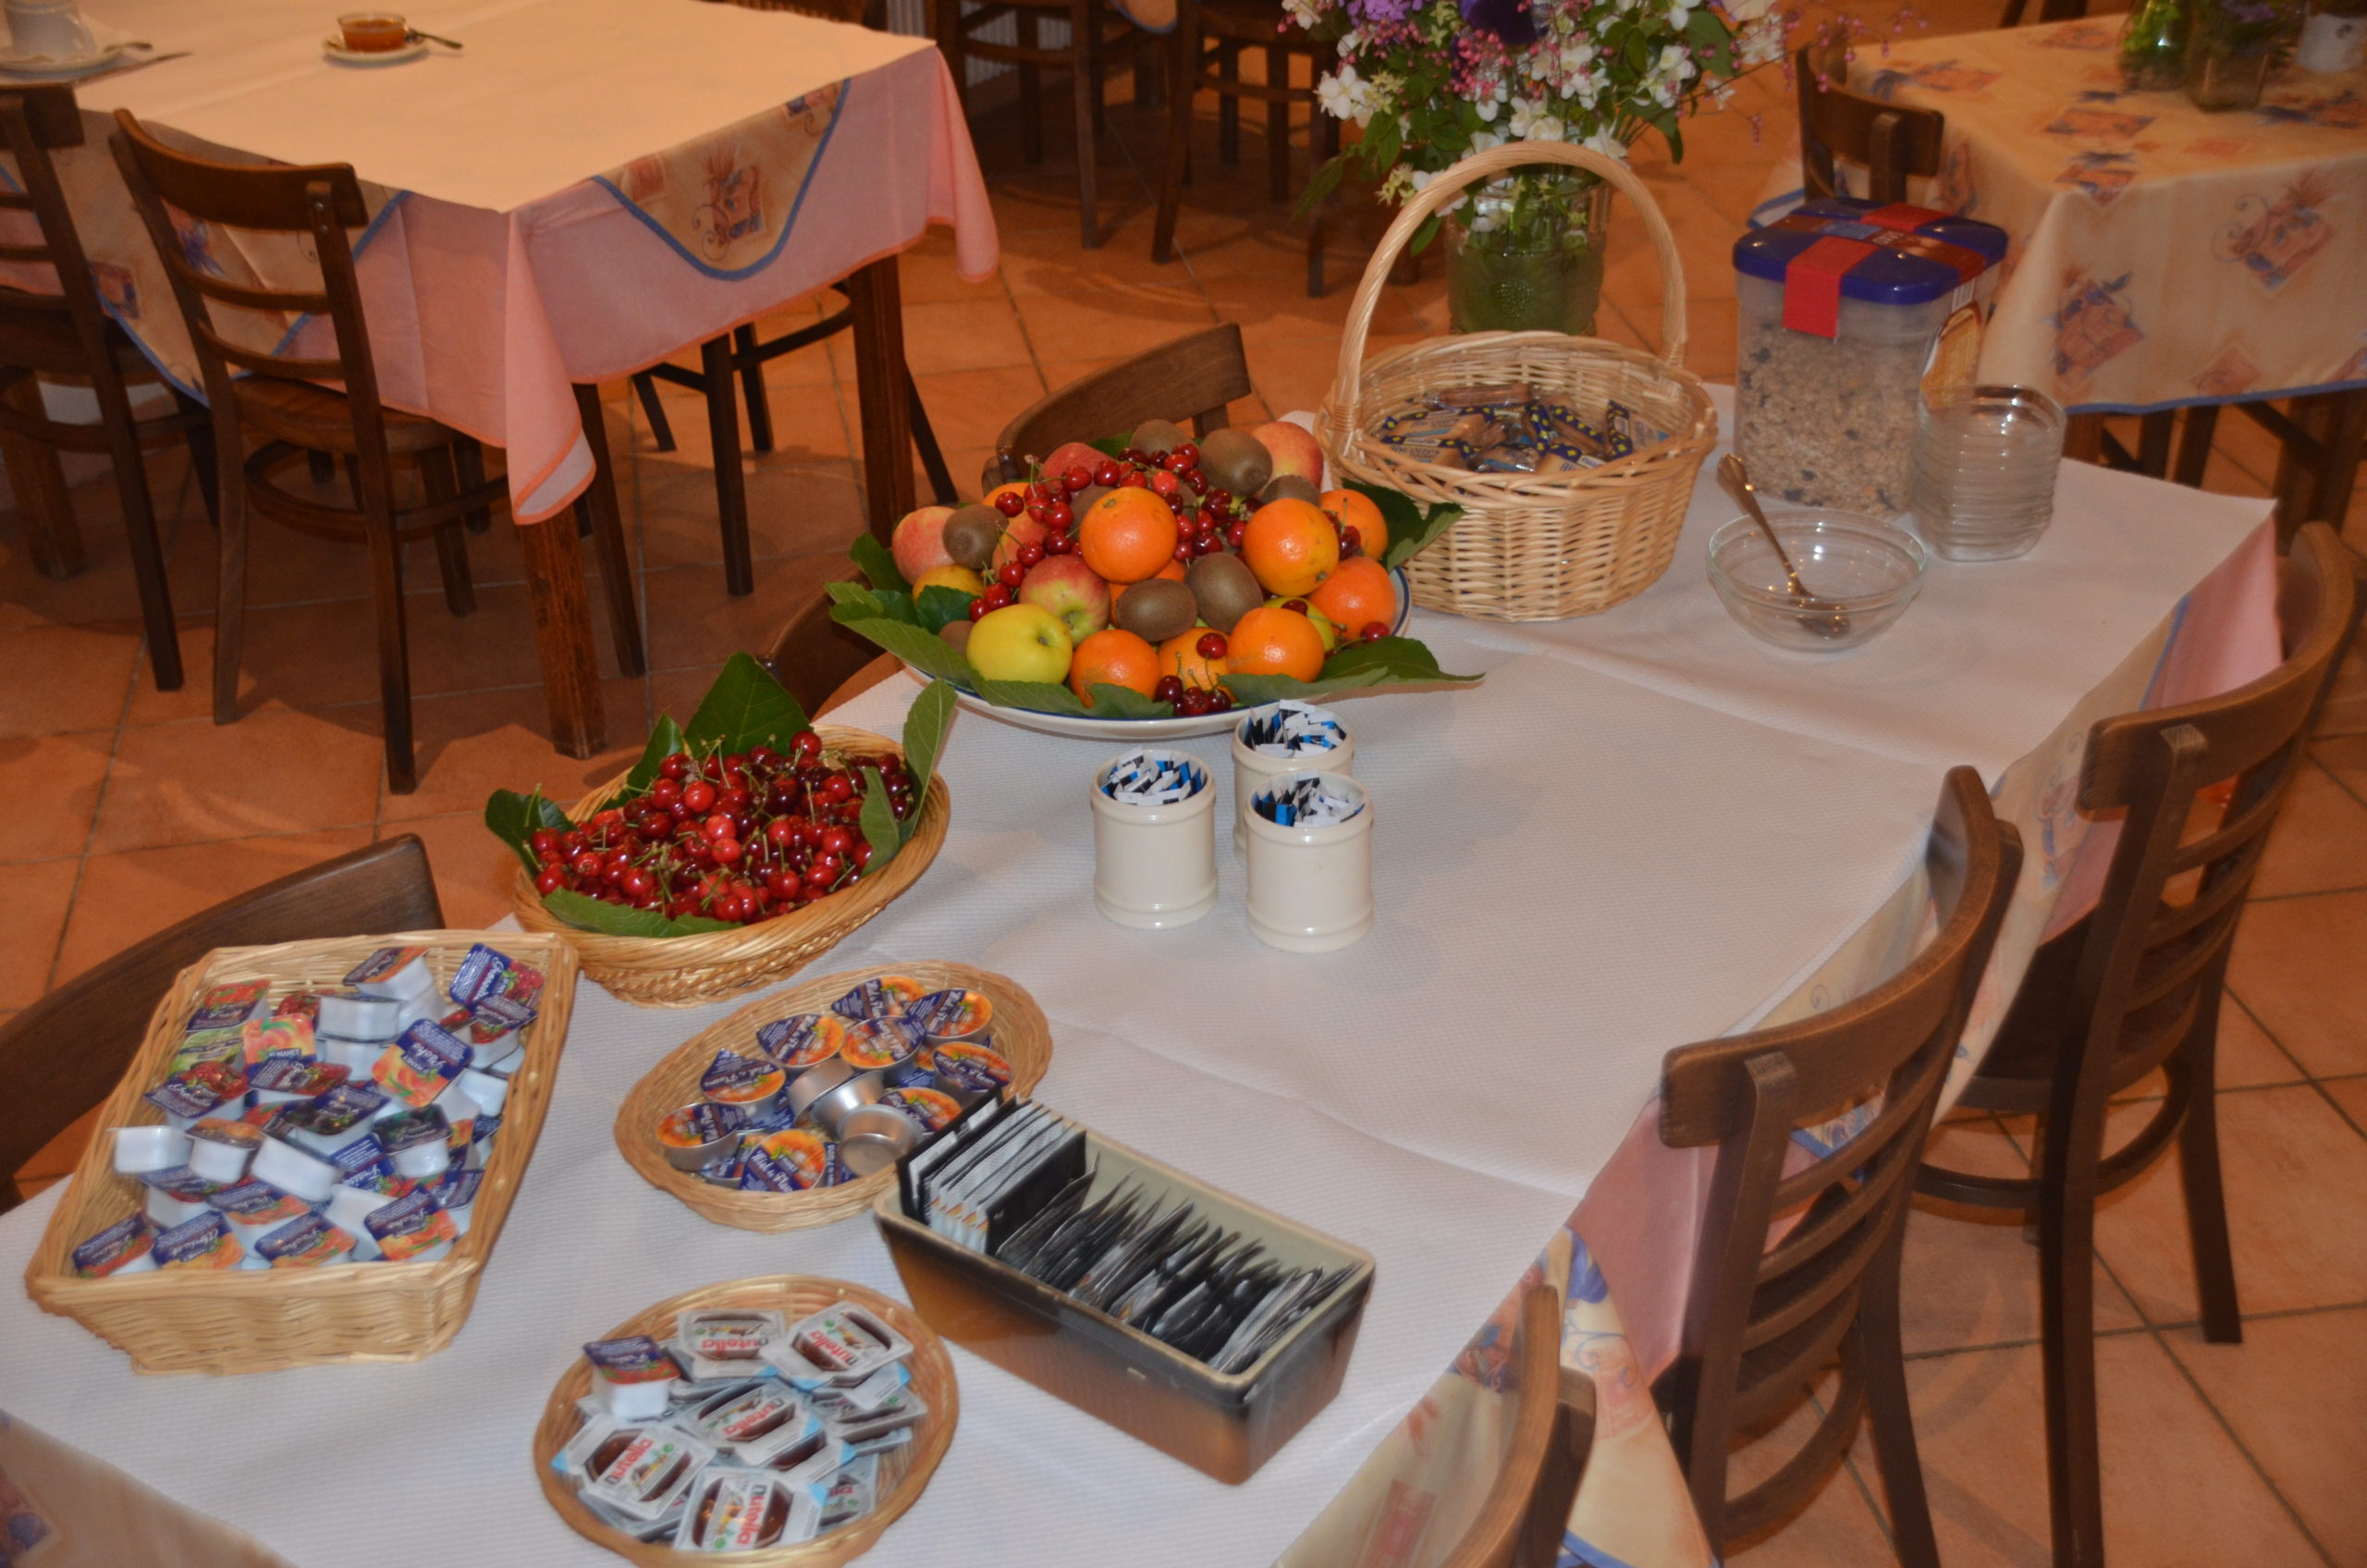 pech de malet - Hotel Restaurant- petit déjeuner- vitrac dordogne sarlat